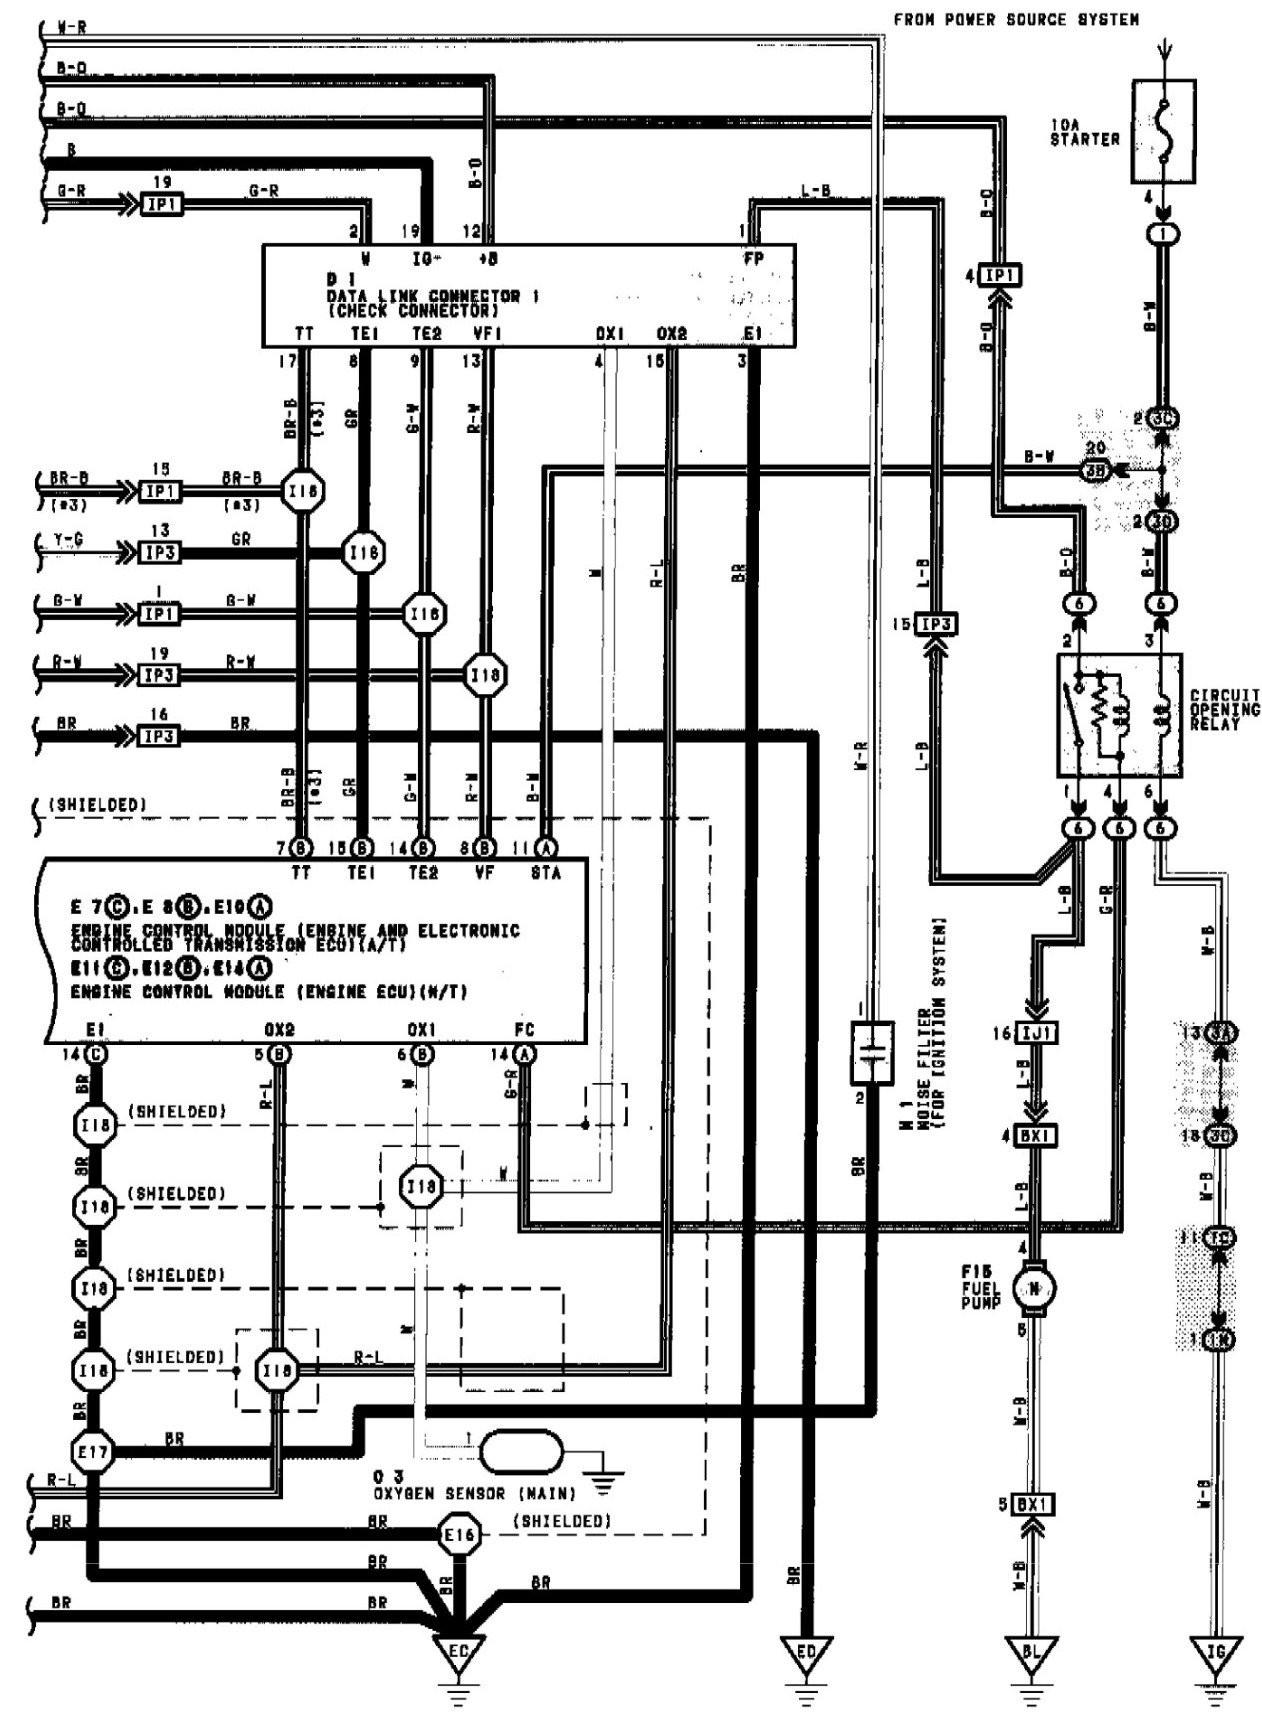 2002 Toyota Camry Wiring Diagram